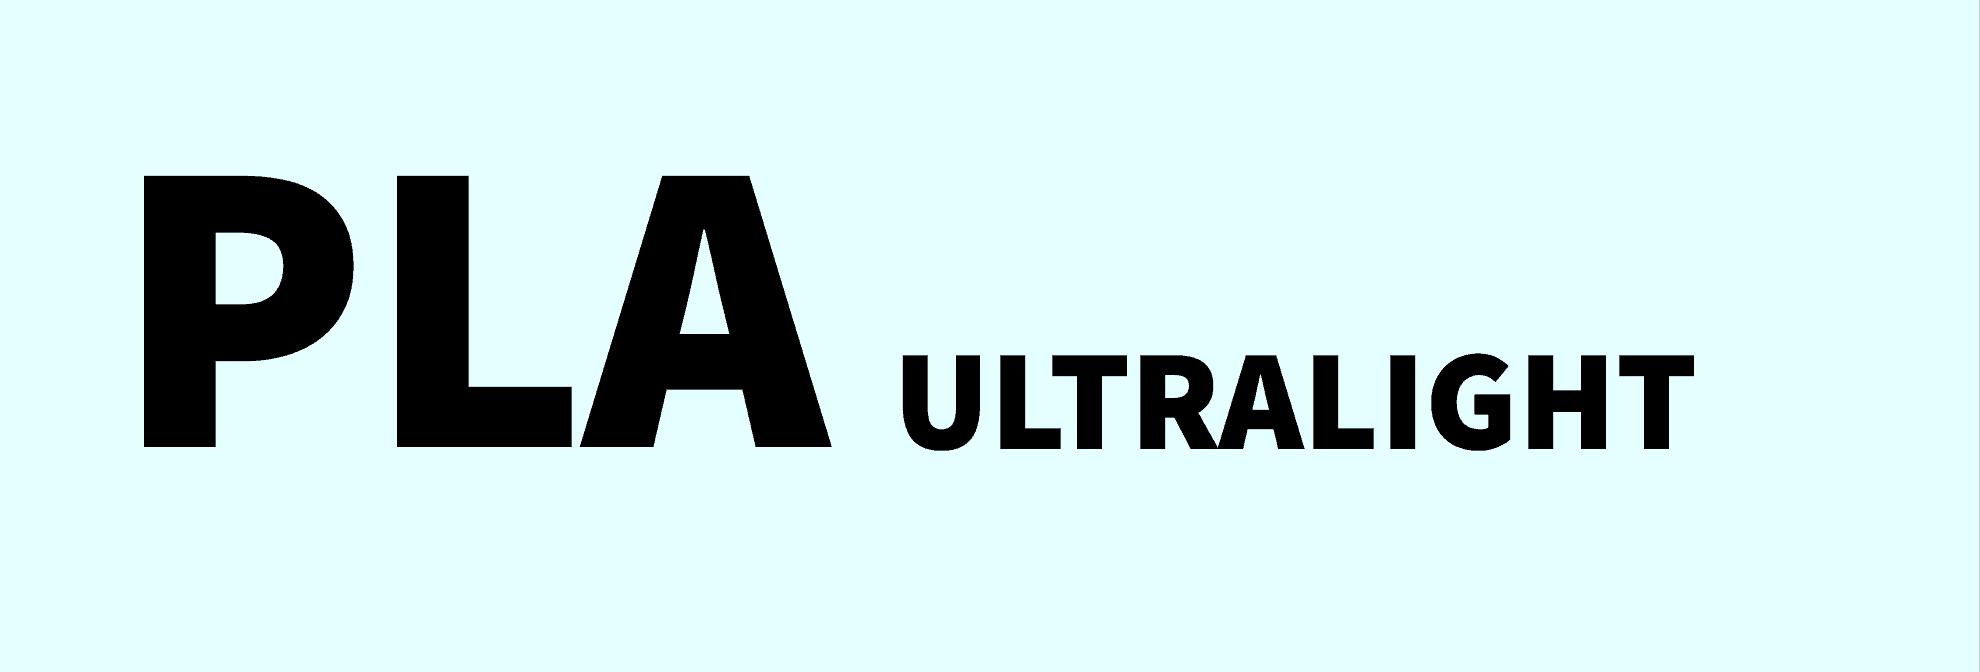 PLA Ultralight website@2x